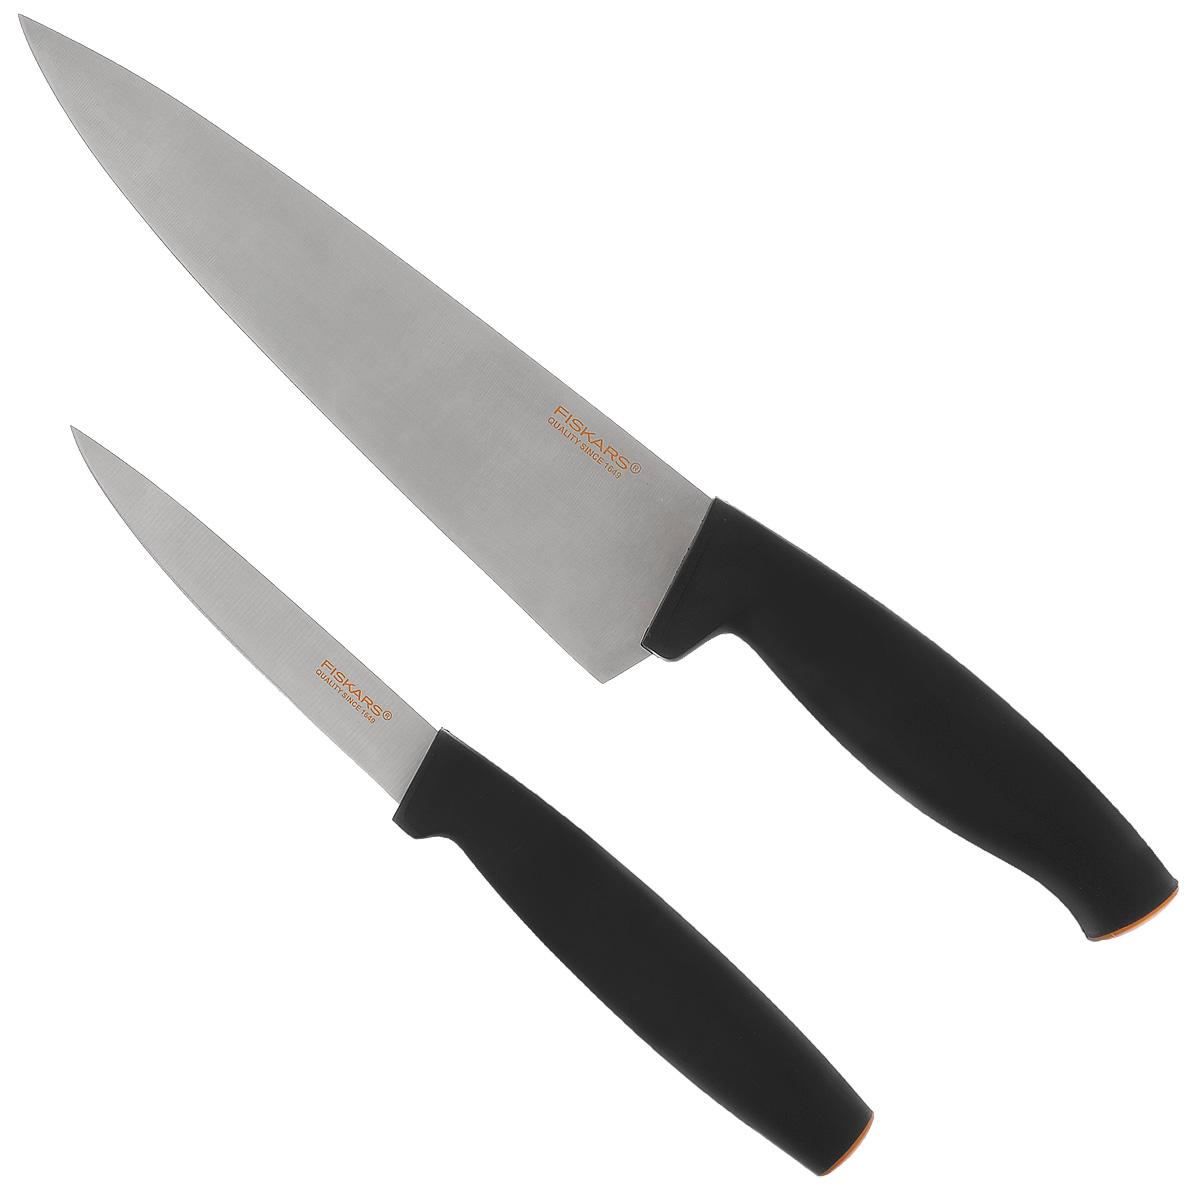 Набор ножей Fiskars Functional Form, 2 шт